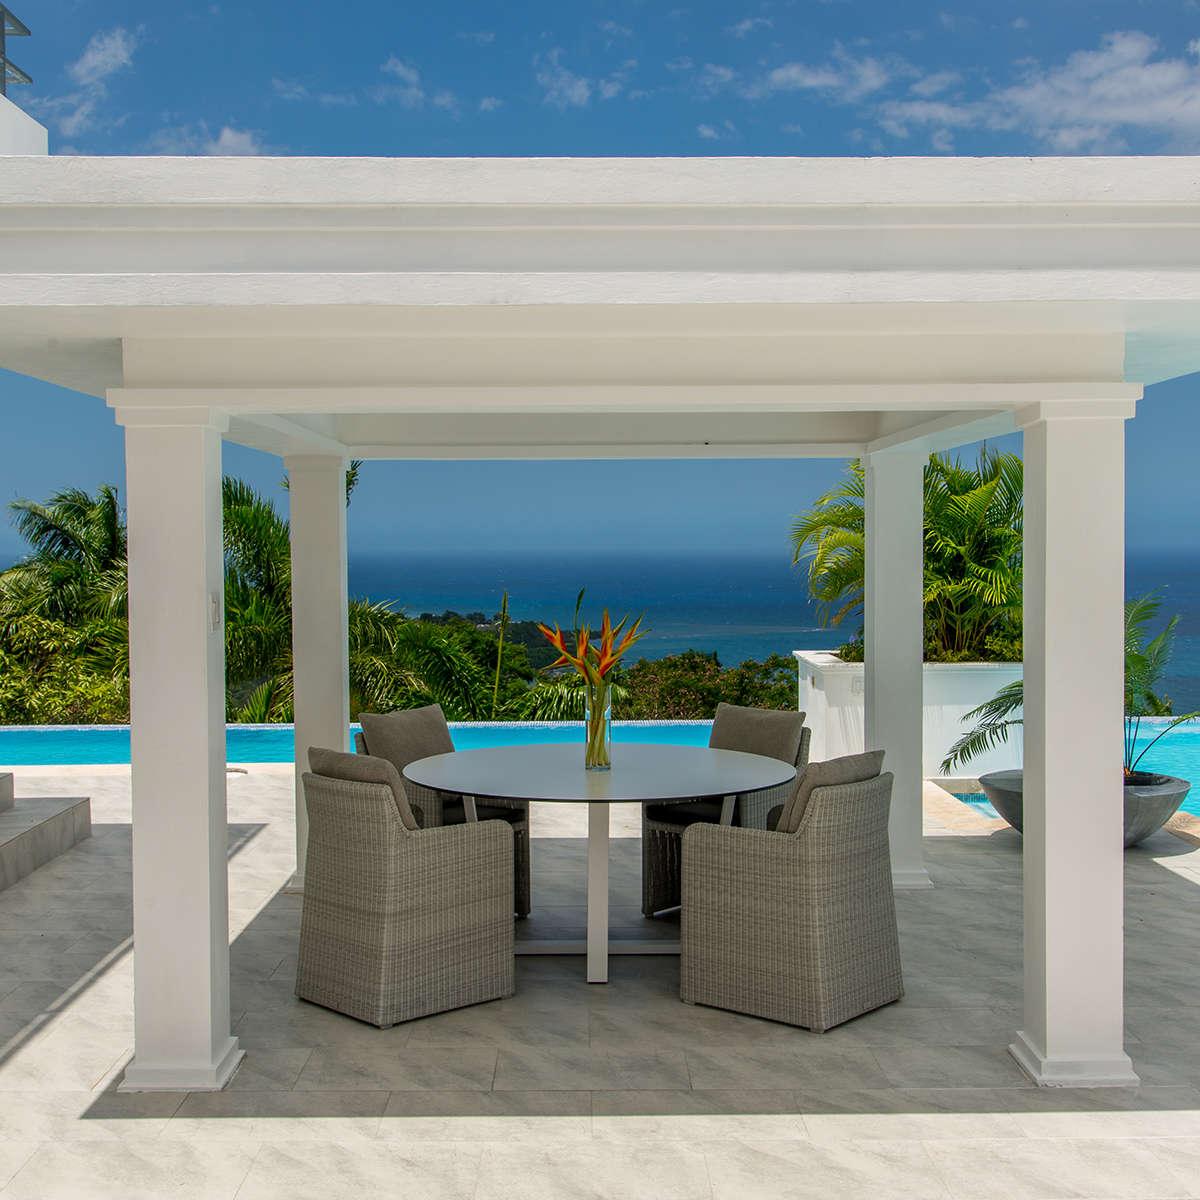 Manutti Fuse Dining Table Round Villa Destiny Project Image Hr 6